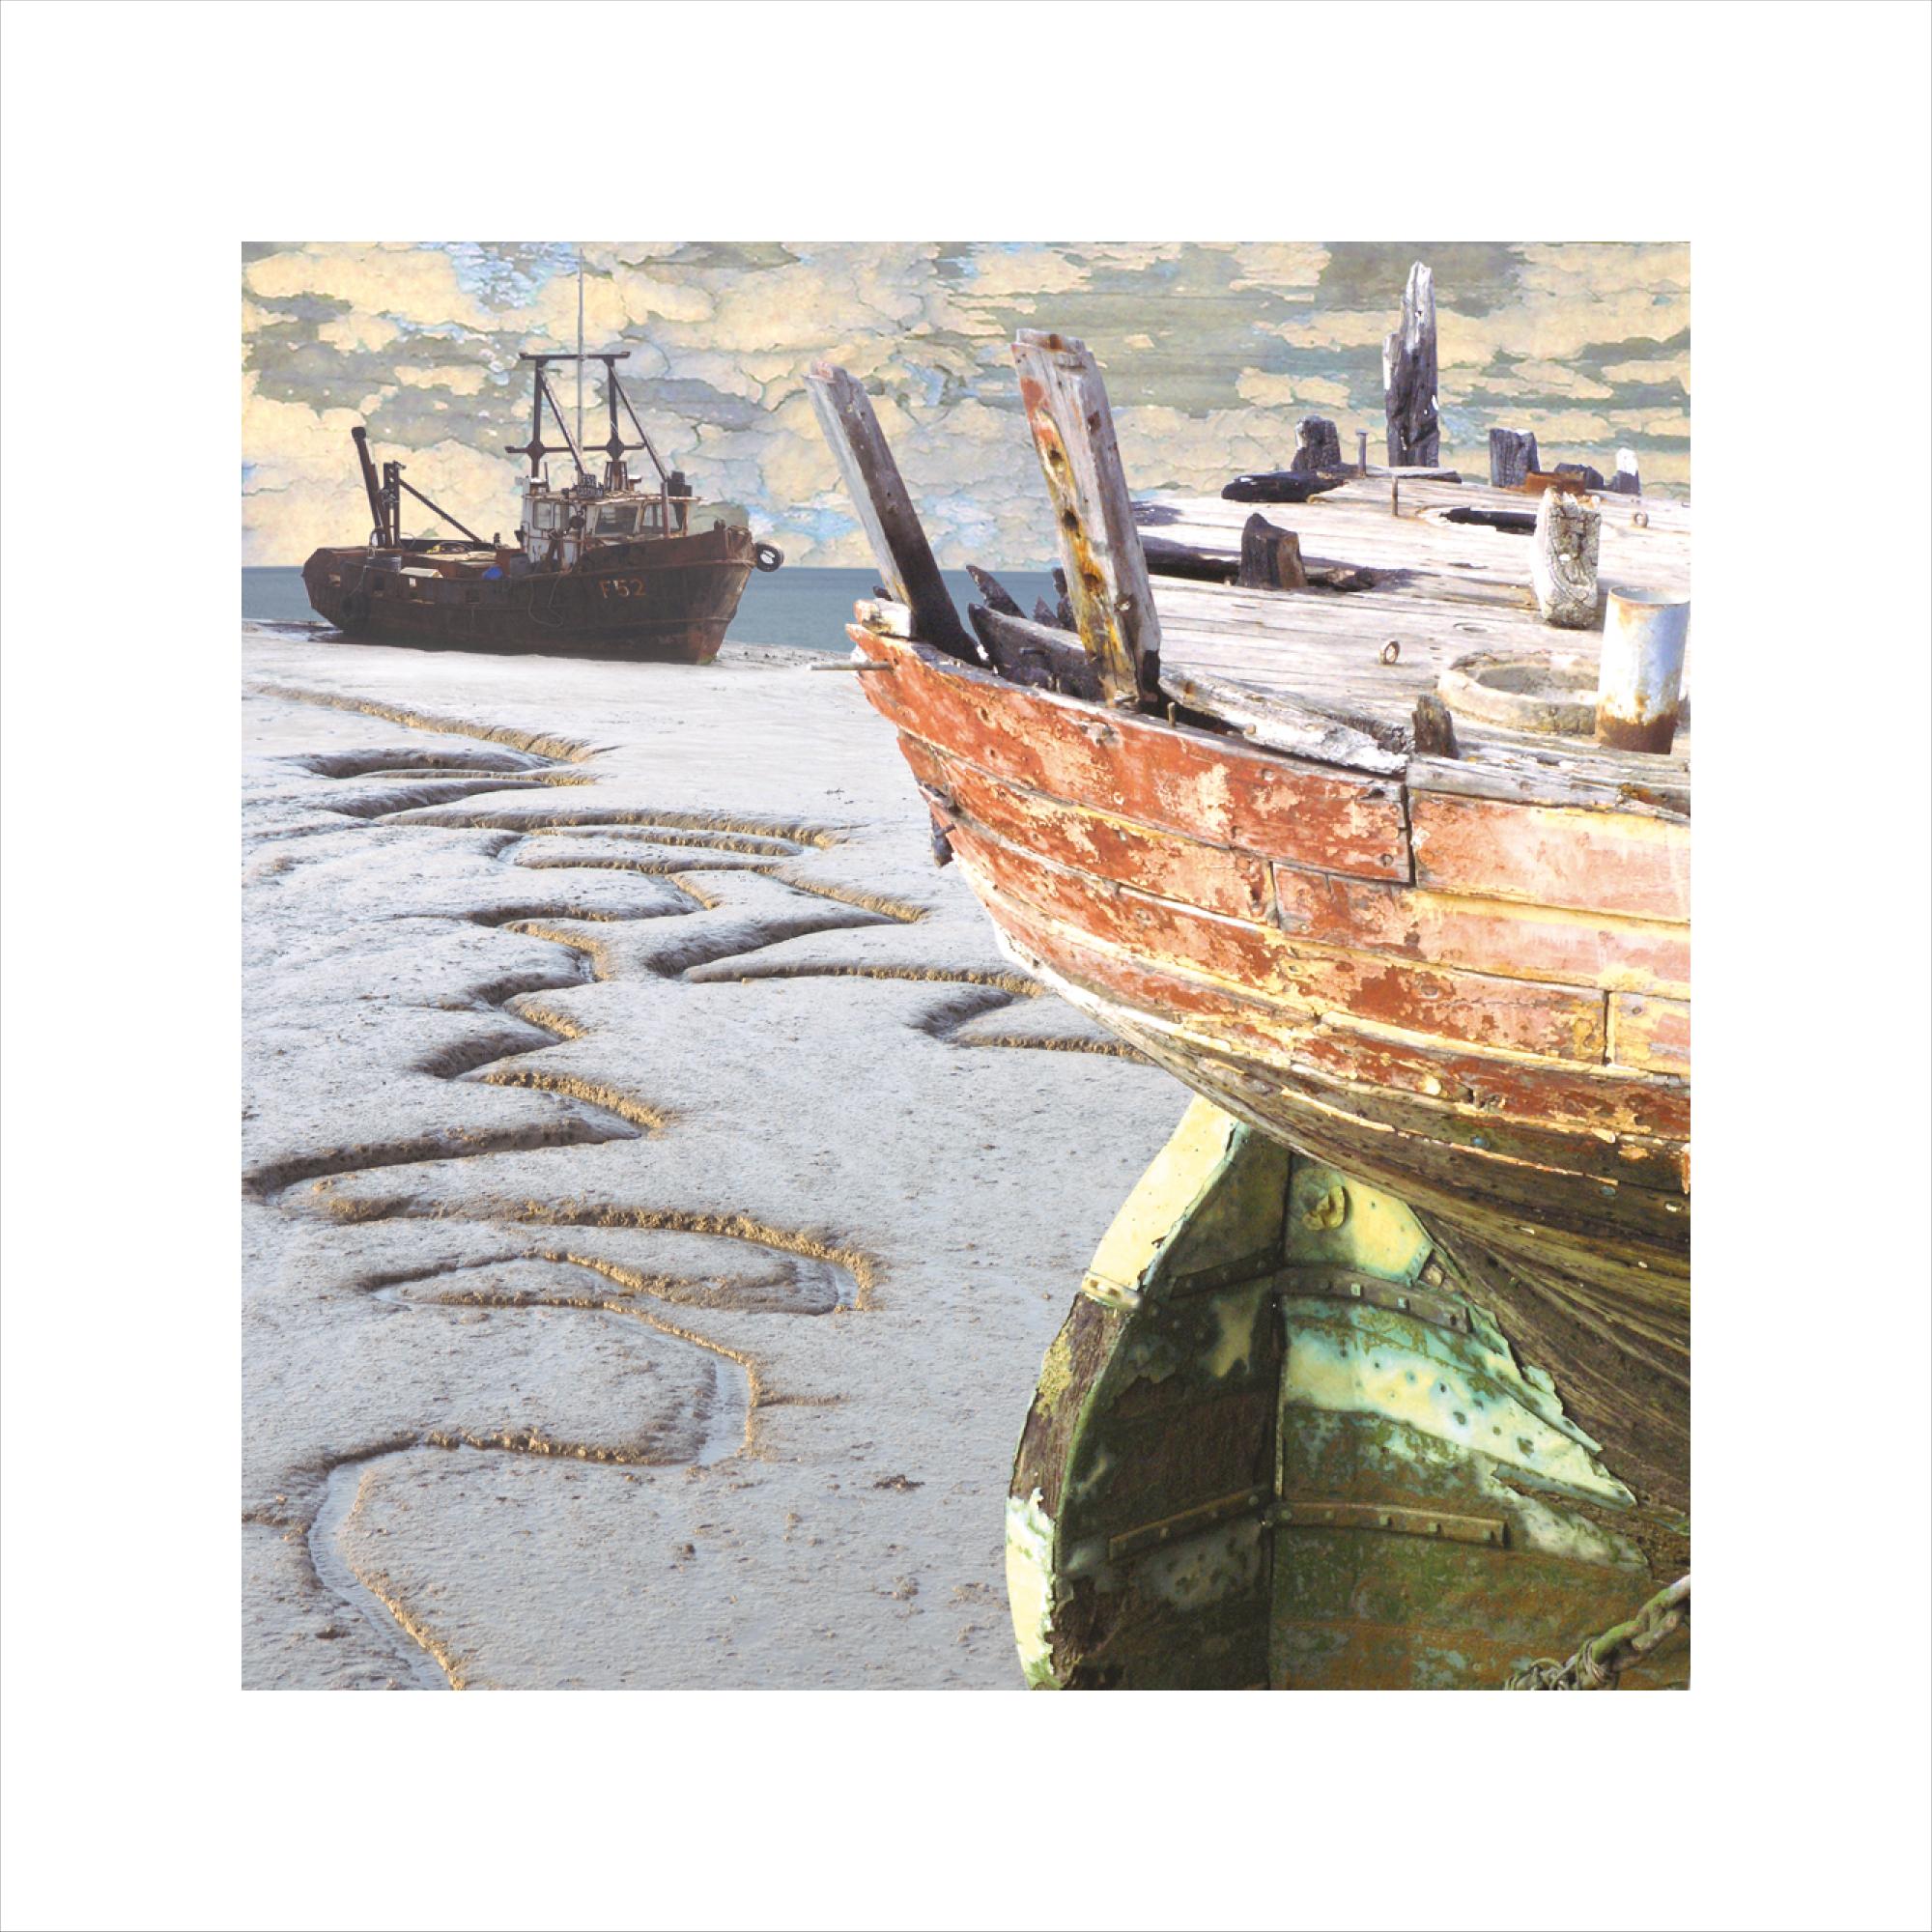 Claire Gill, Limited edition prints, digital photomontage, fine art prints, hahnemuhle, coastal art, Collect Art, seascape 2, Grays, Thames